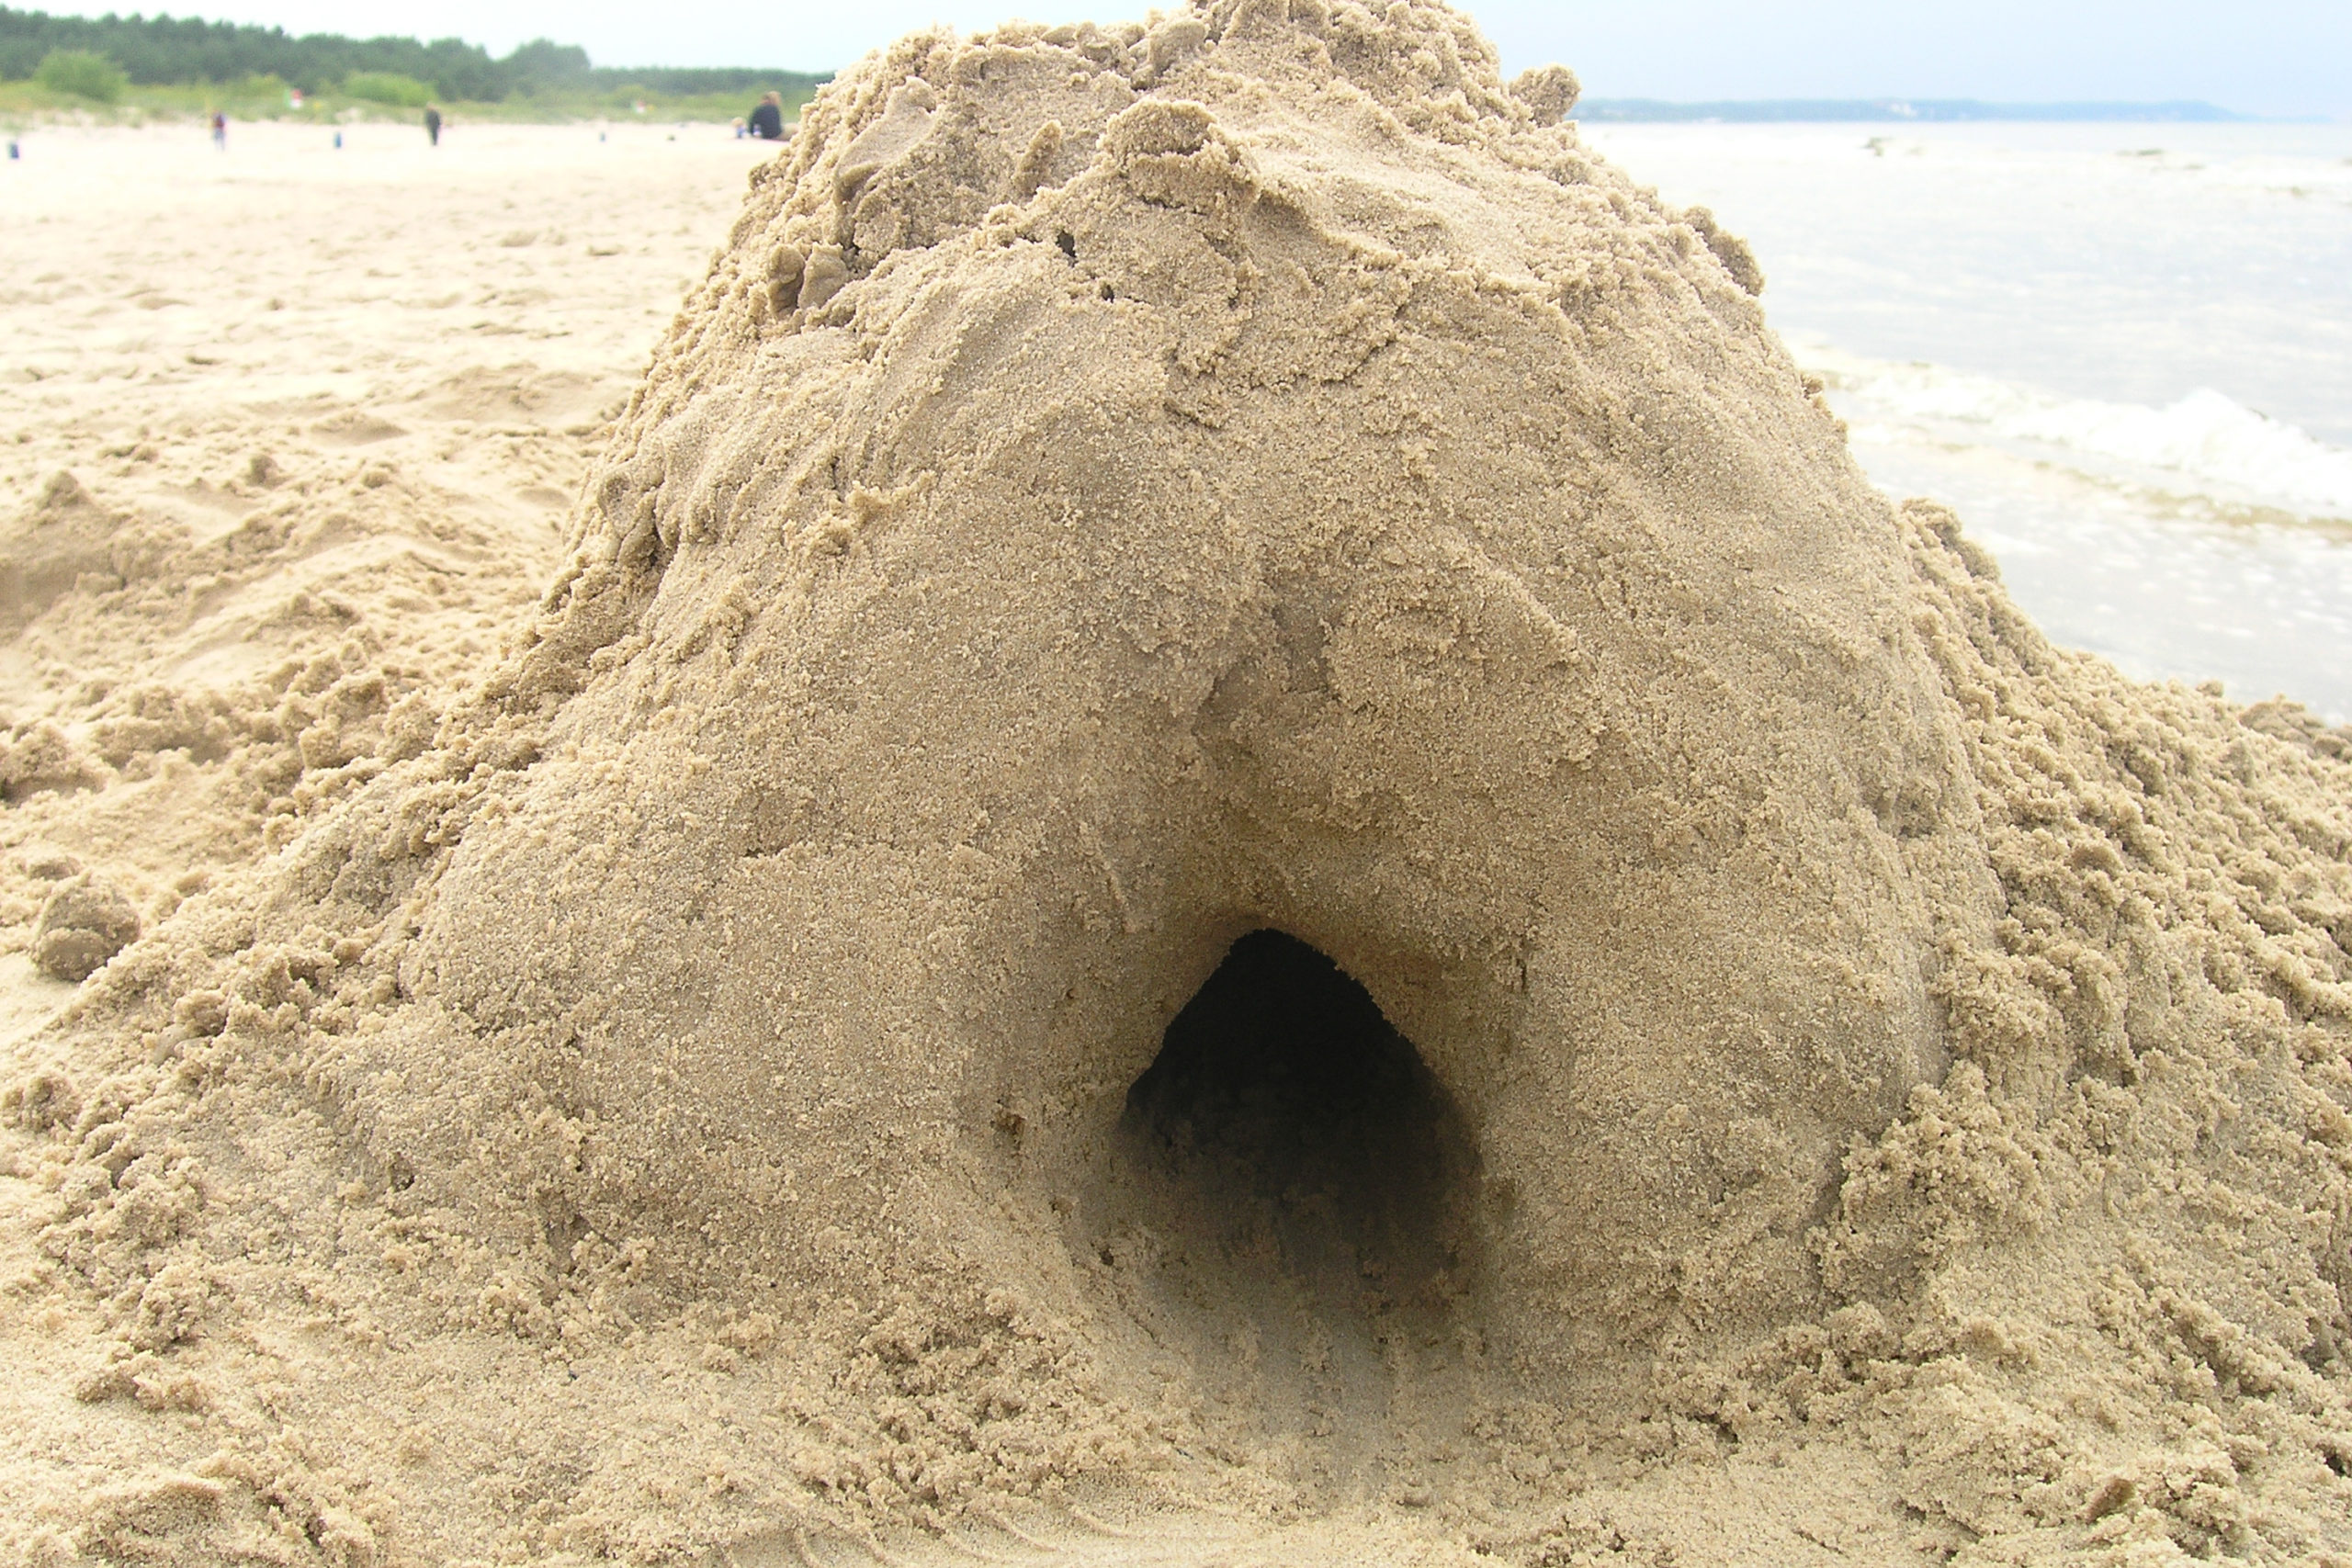 wisełka jaskinia z piasku